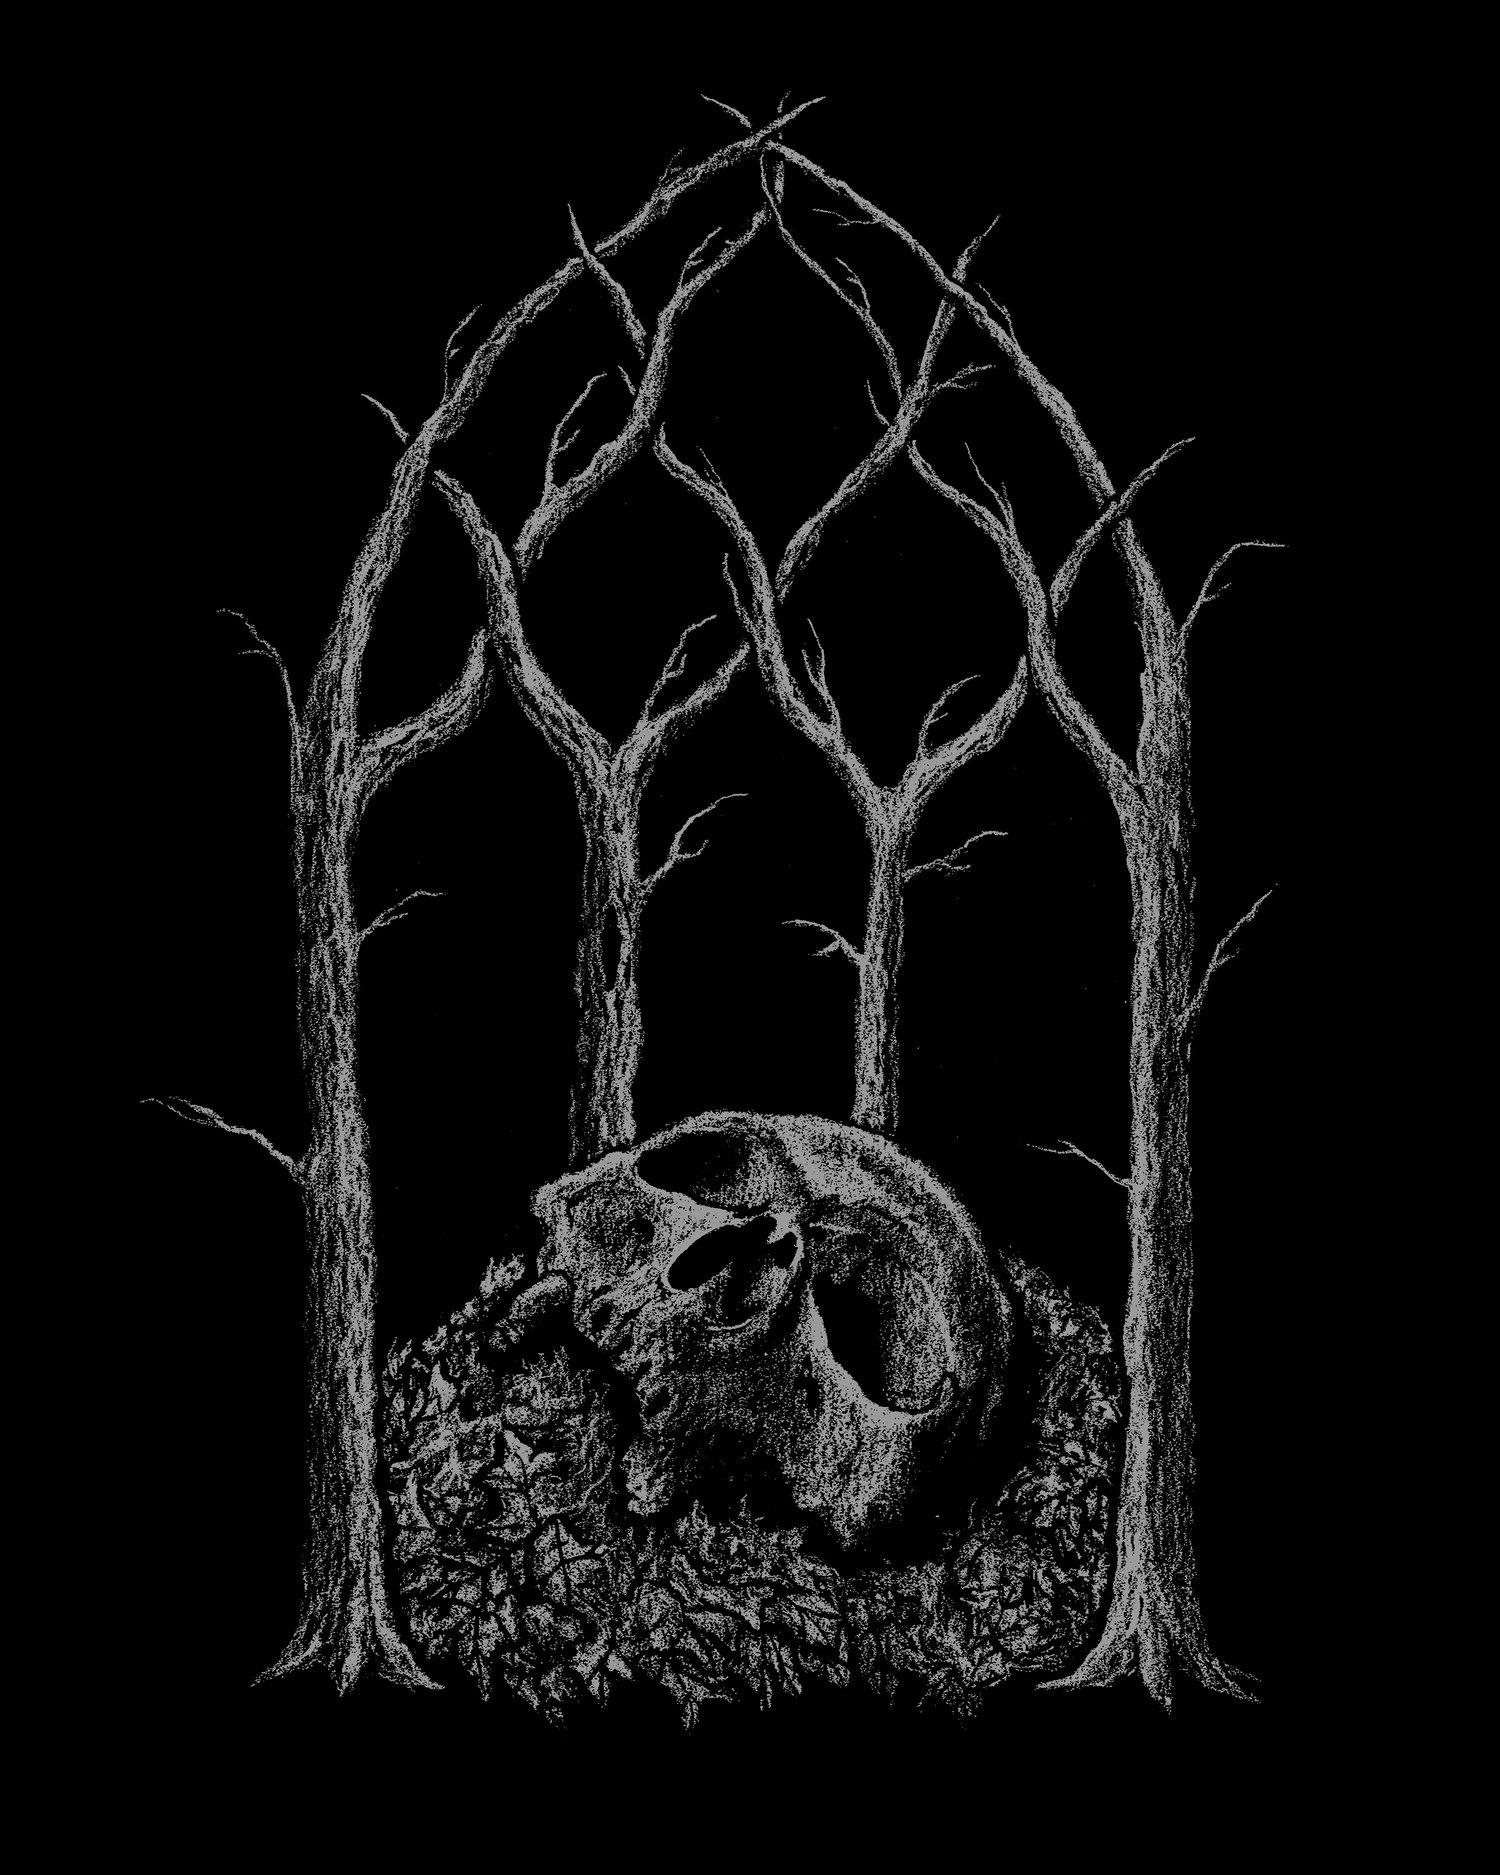 Dylan+Garrett+Smith+Unholy+are+the+Ghosts+print+16x20+grey.jpg